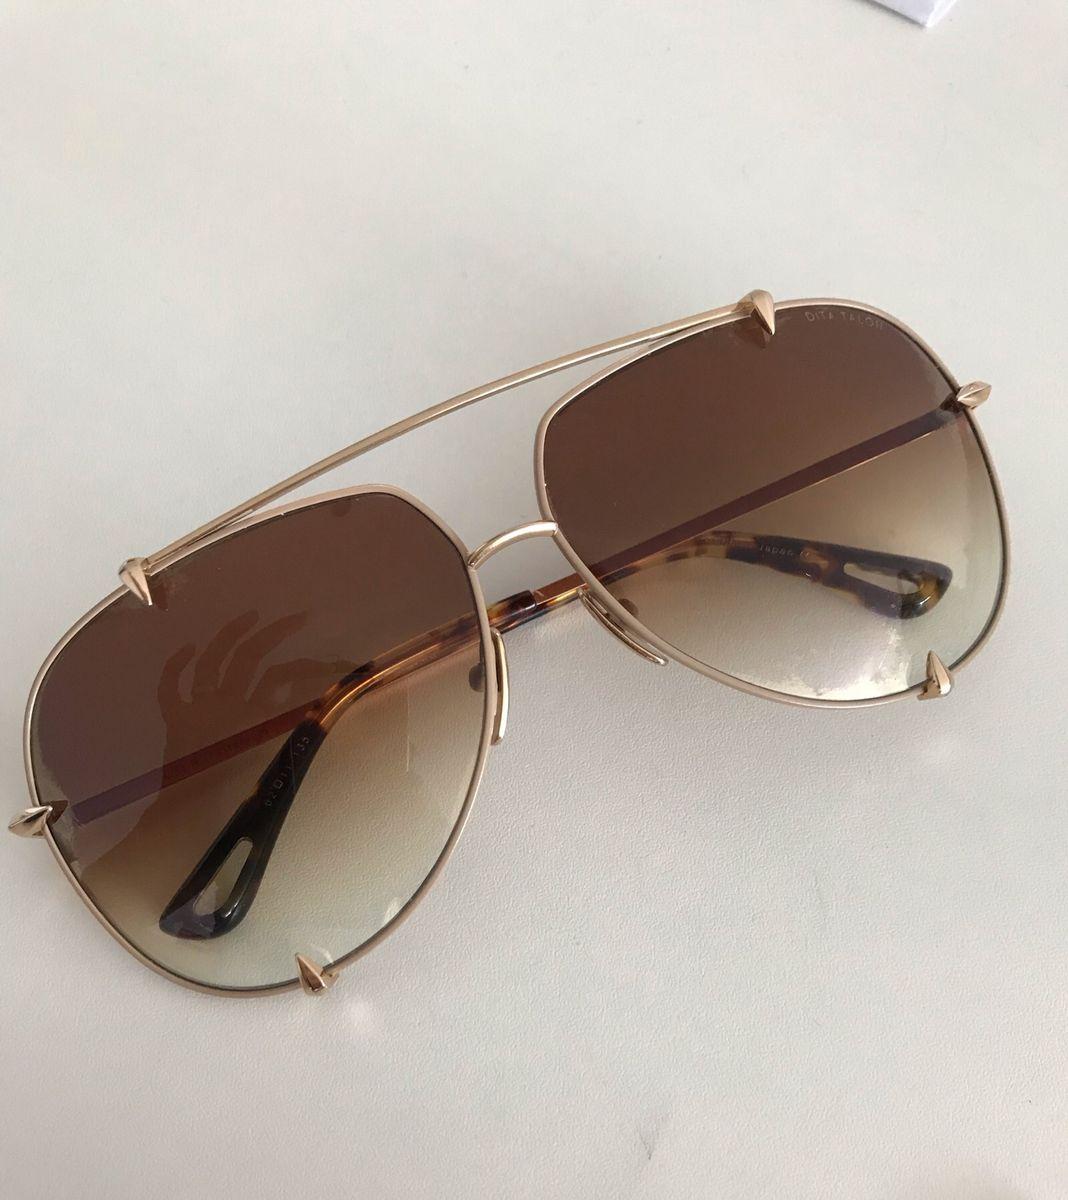 bf569c53af99b óculos de sol dita talon - óculos dita.  Czm6ly9wag90b3muzw5qb2vplmnvbs5ici9wcm9kdwn0cy8xmte1mdexmc9immewndmxytuznjezzda5yjhmn2uxnzniymixodu2zc5qcgc  ...